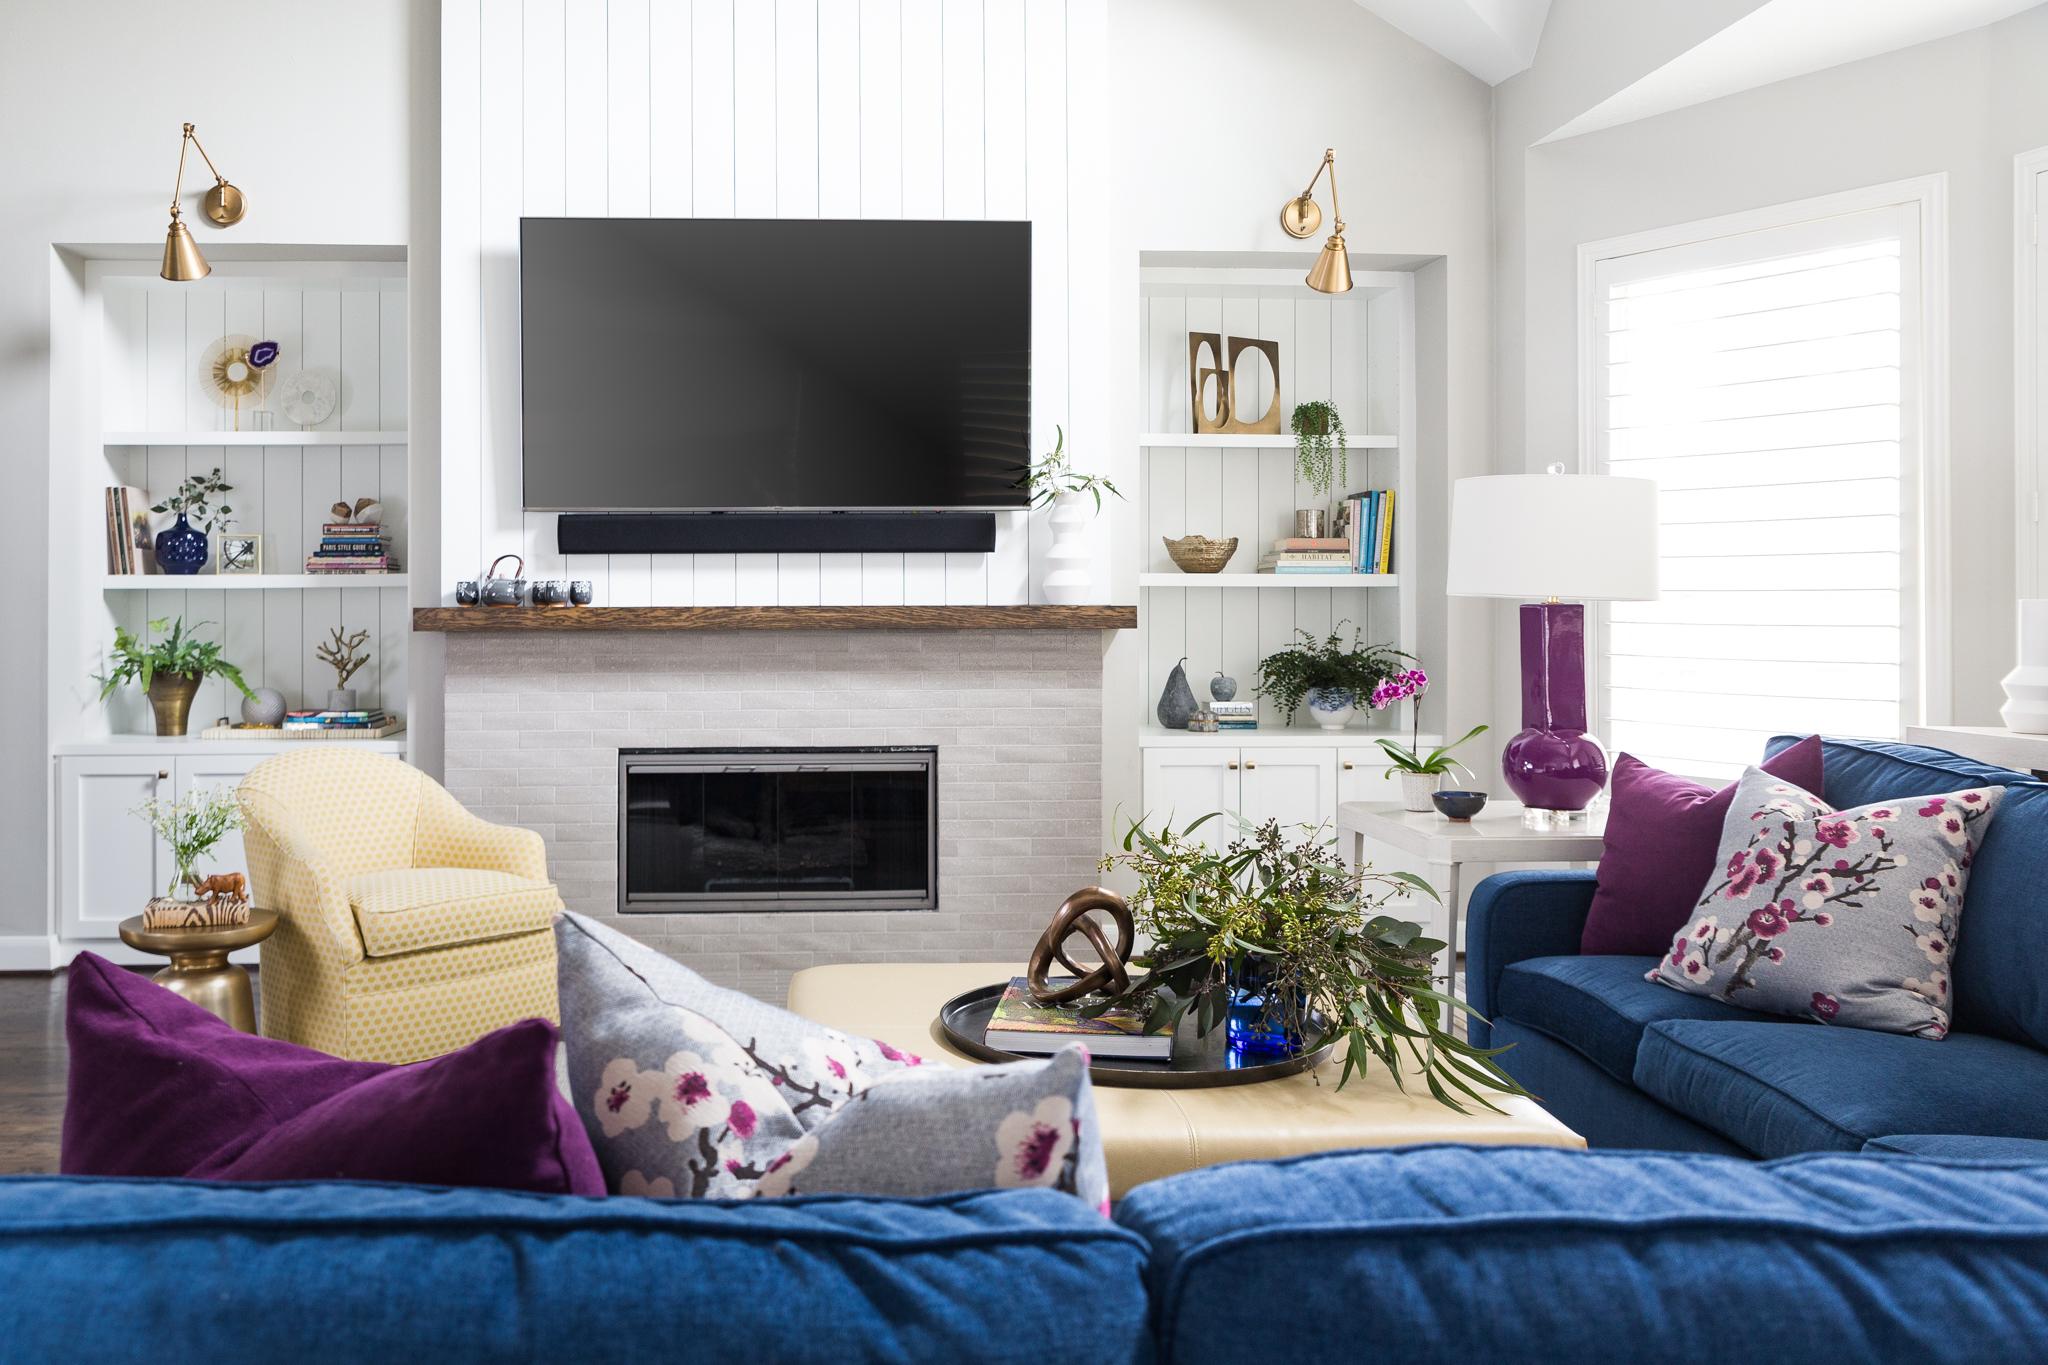 BEFORE AND AFTER - A Fresh, Light Family-Friendly Home Makeover | Carla Aston, Designer | Colleen Scott, Photographer #livingroom #livingroomideas